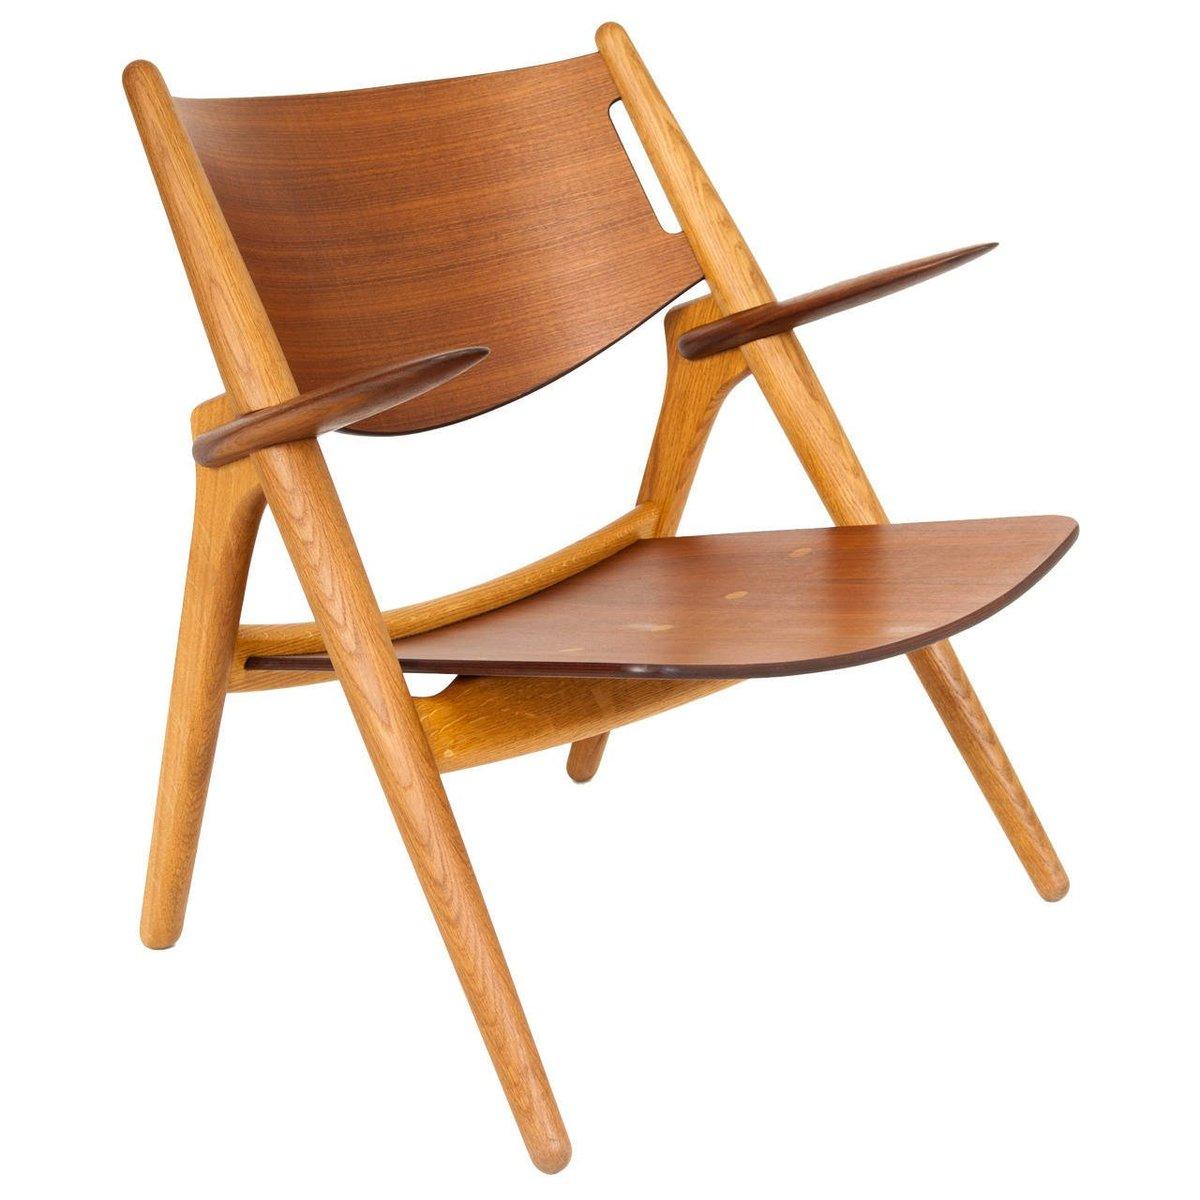 vintage modell ch28 sessel von hans j wegner bei pamono. Black Bedroom Furniture Sets. Home Design Ideas